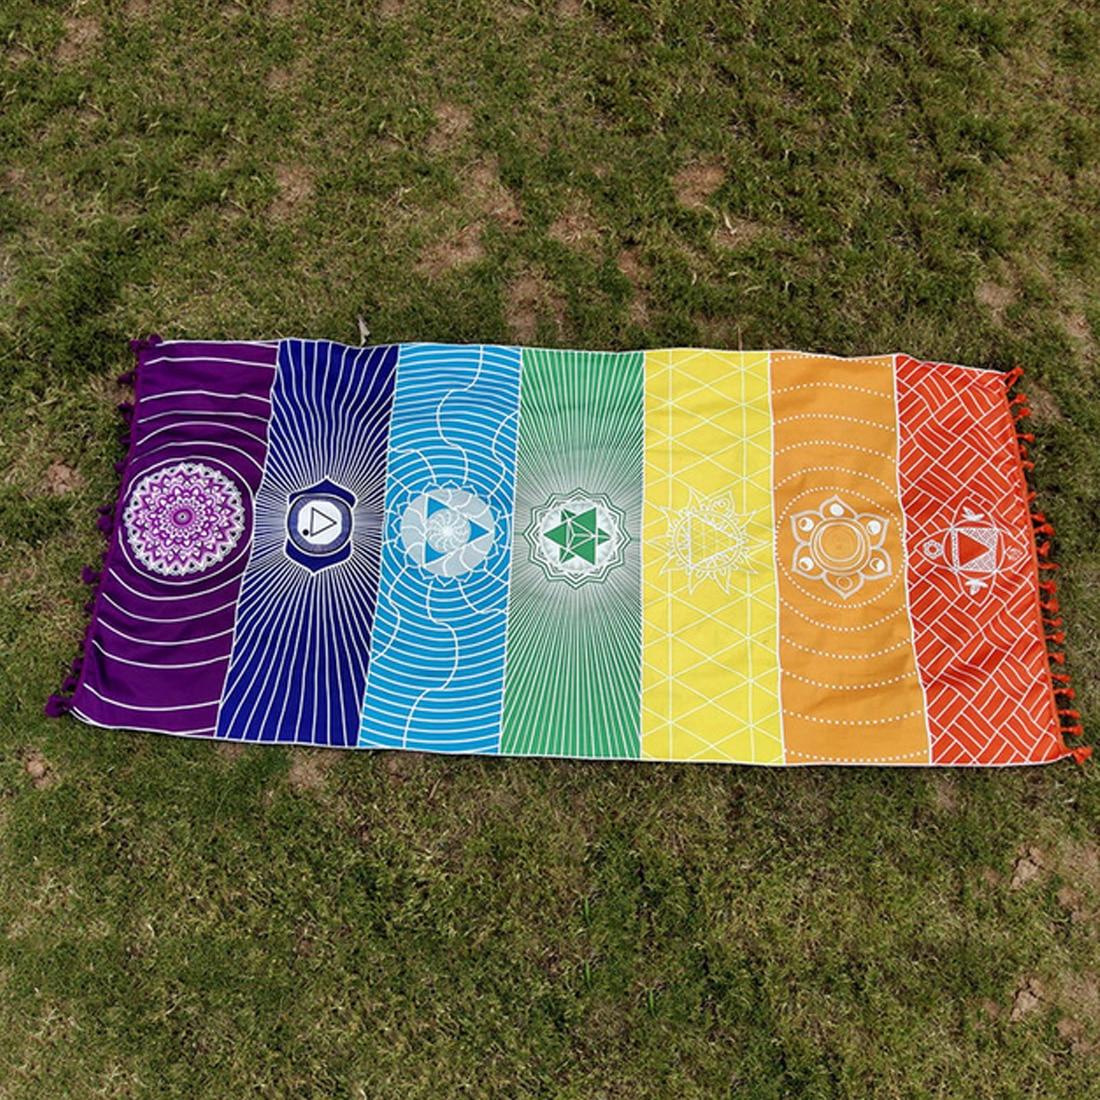 Gift Polyester Bohemia Wall Hanging India Mandala Blanket 7 Chakra Colored Tapestry Rainbow Stripes Travel Beach Yoga Mat